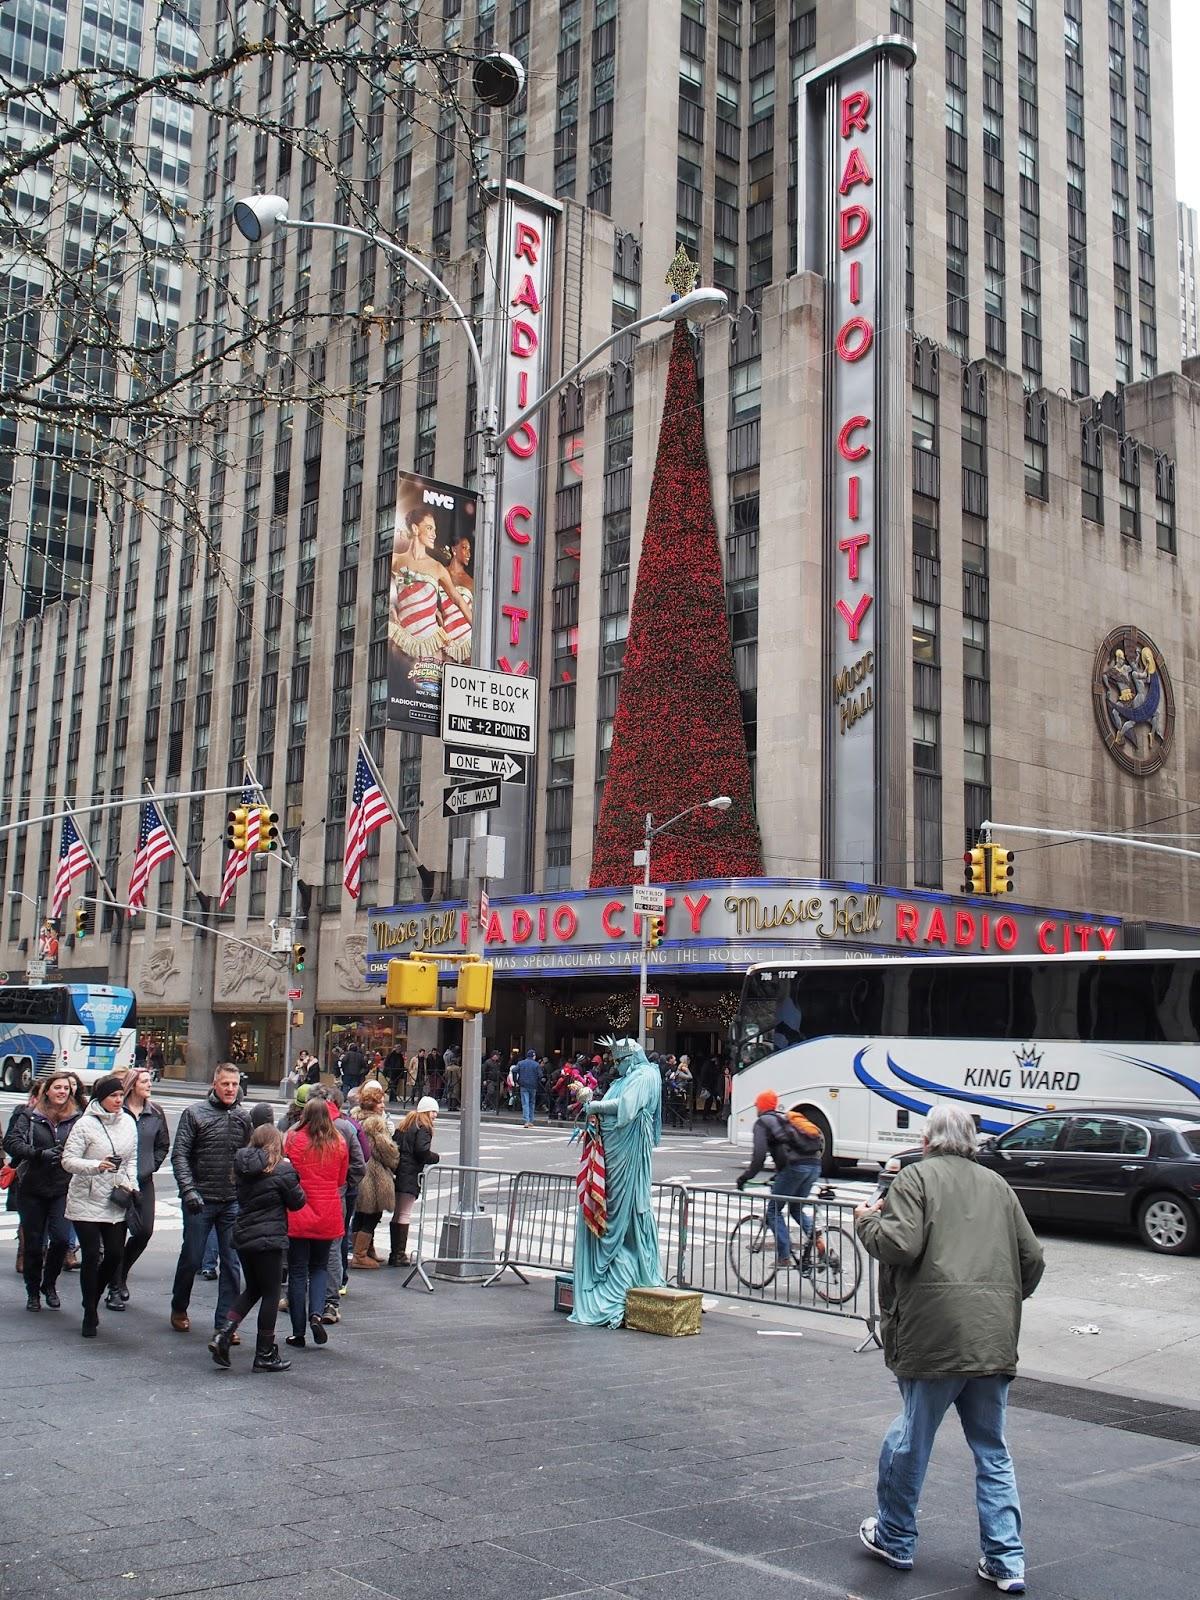 APhotoOpportunityIfEverThereWasOne #statueofliberty  #radiocity #holidays #besttimeoftheyear #nyc ©2014 Nancy Lundebjerg